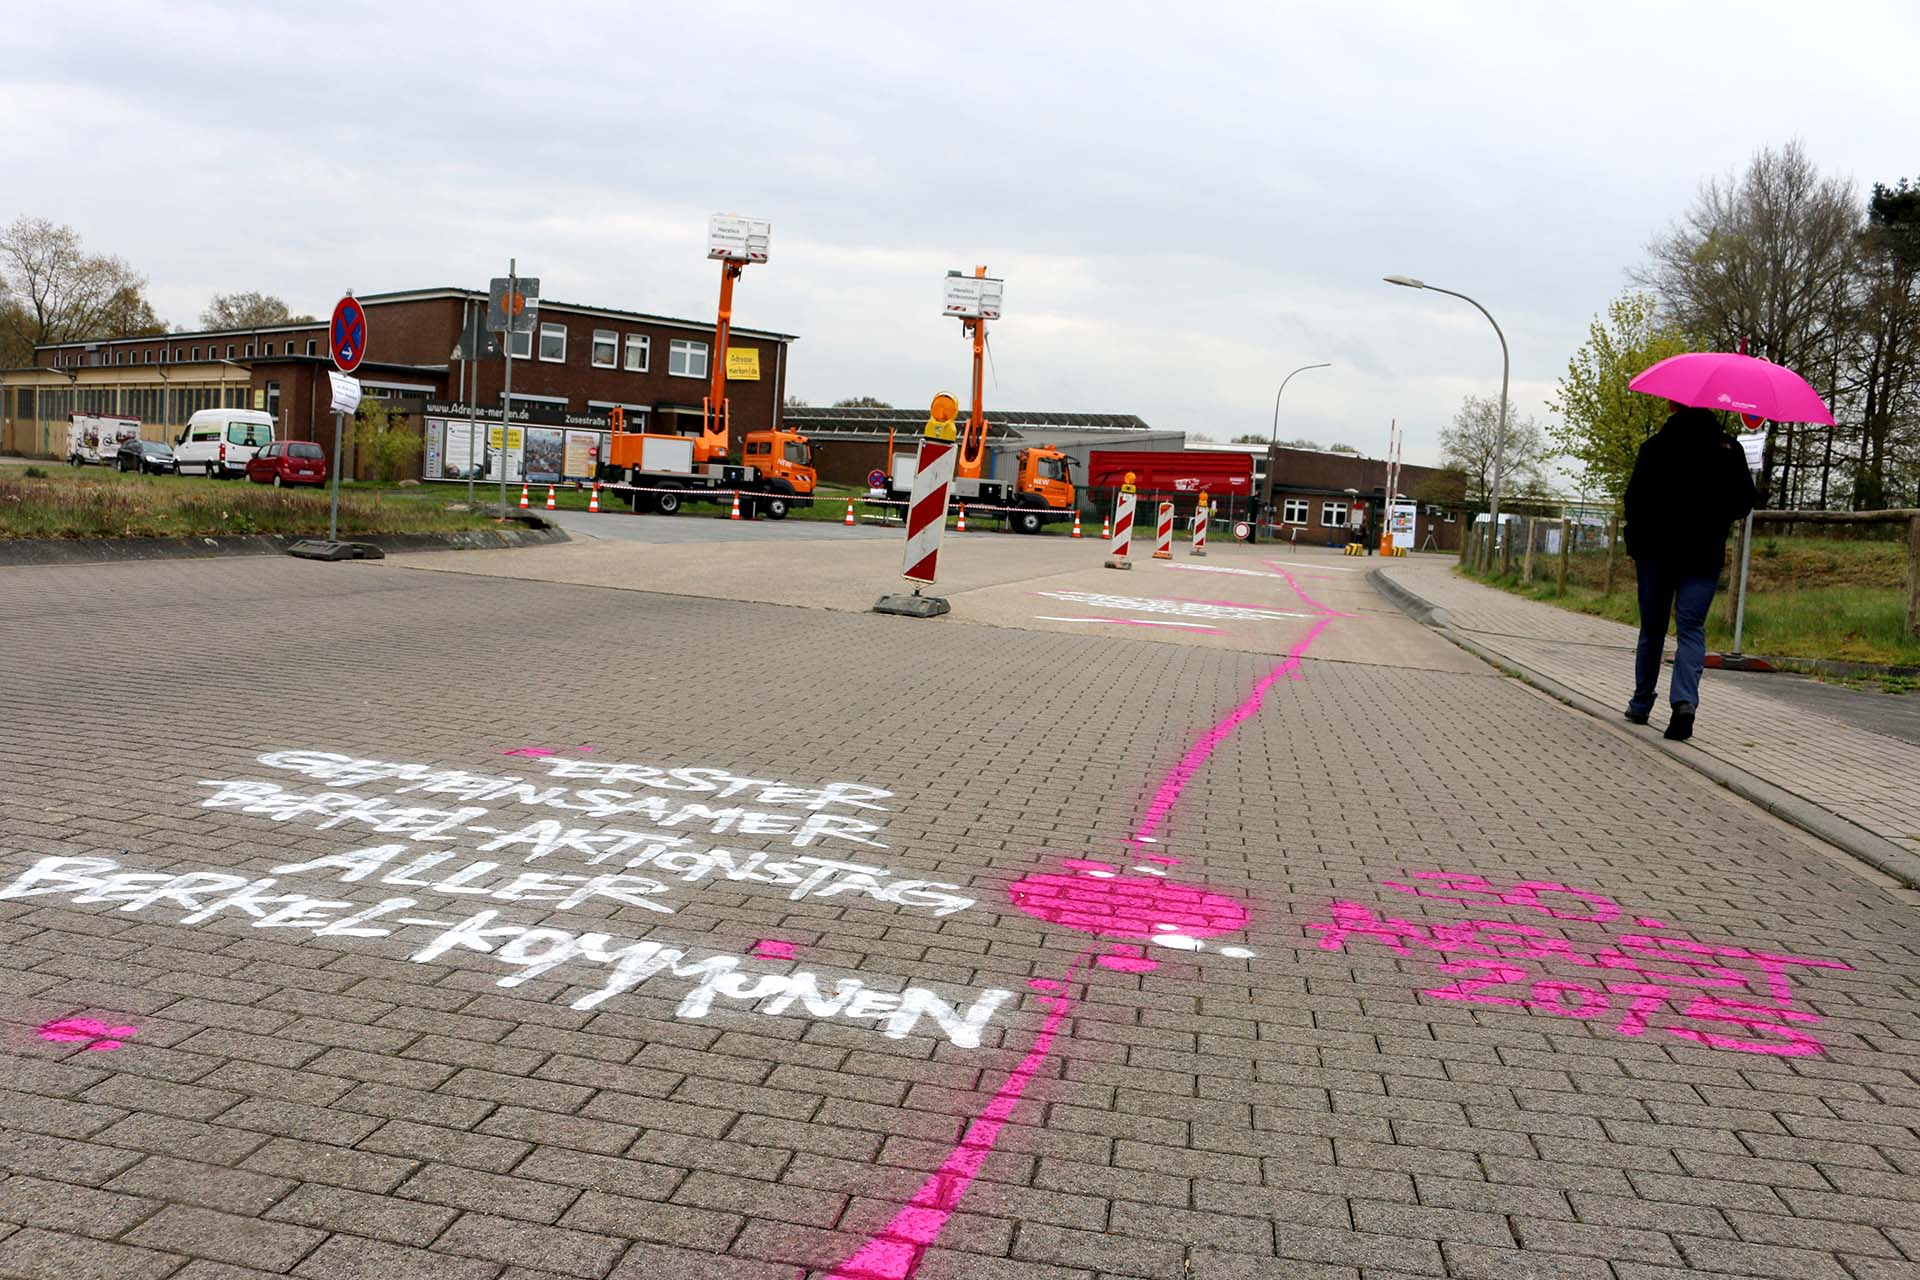 Bodenbemalung, Regionale, Graffiti, Zukunftsland, Coesfeld, Sprayen, Urban, Boden, Bennet Grüttner, Studio Auckz